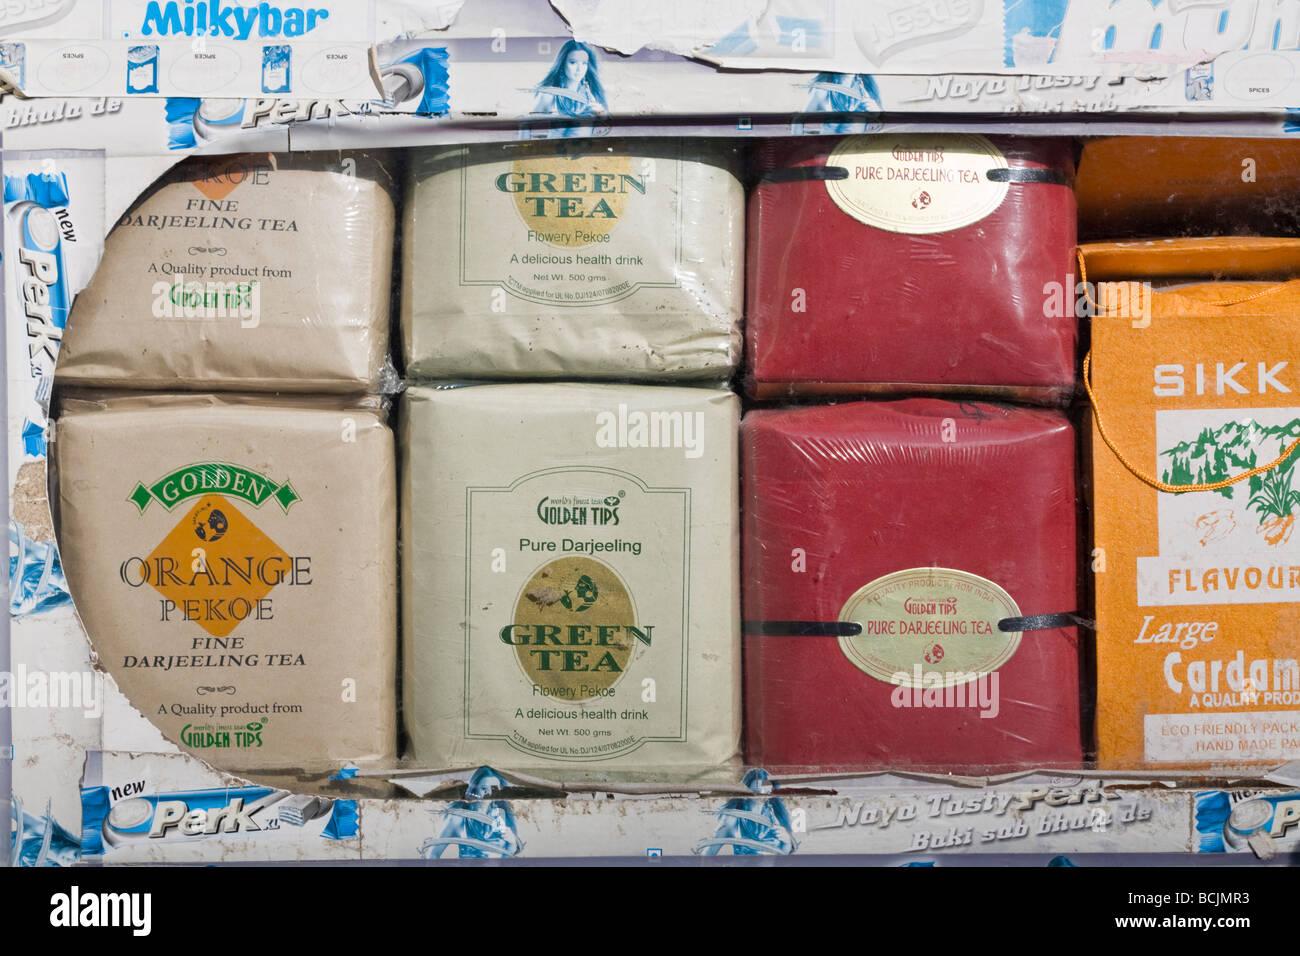 India, Sikkim, Gangtok, Mahatma Gandi Marg, MG Marg, Gangtok, la principale strada dello shopping, tè in vendita Immagini Stock